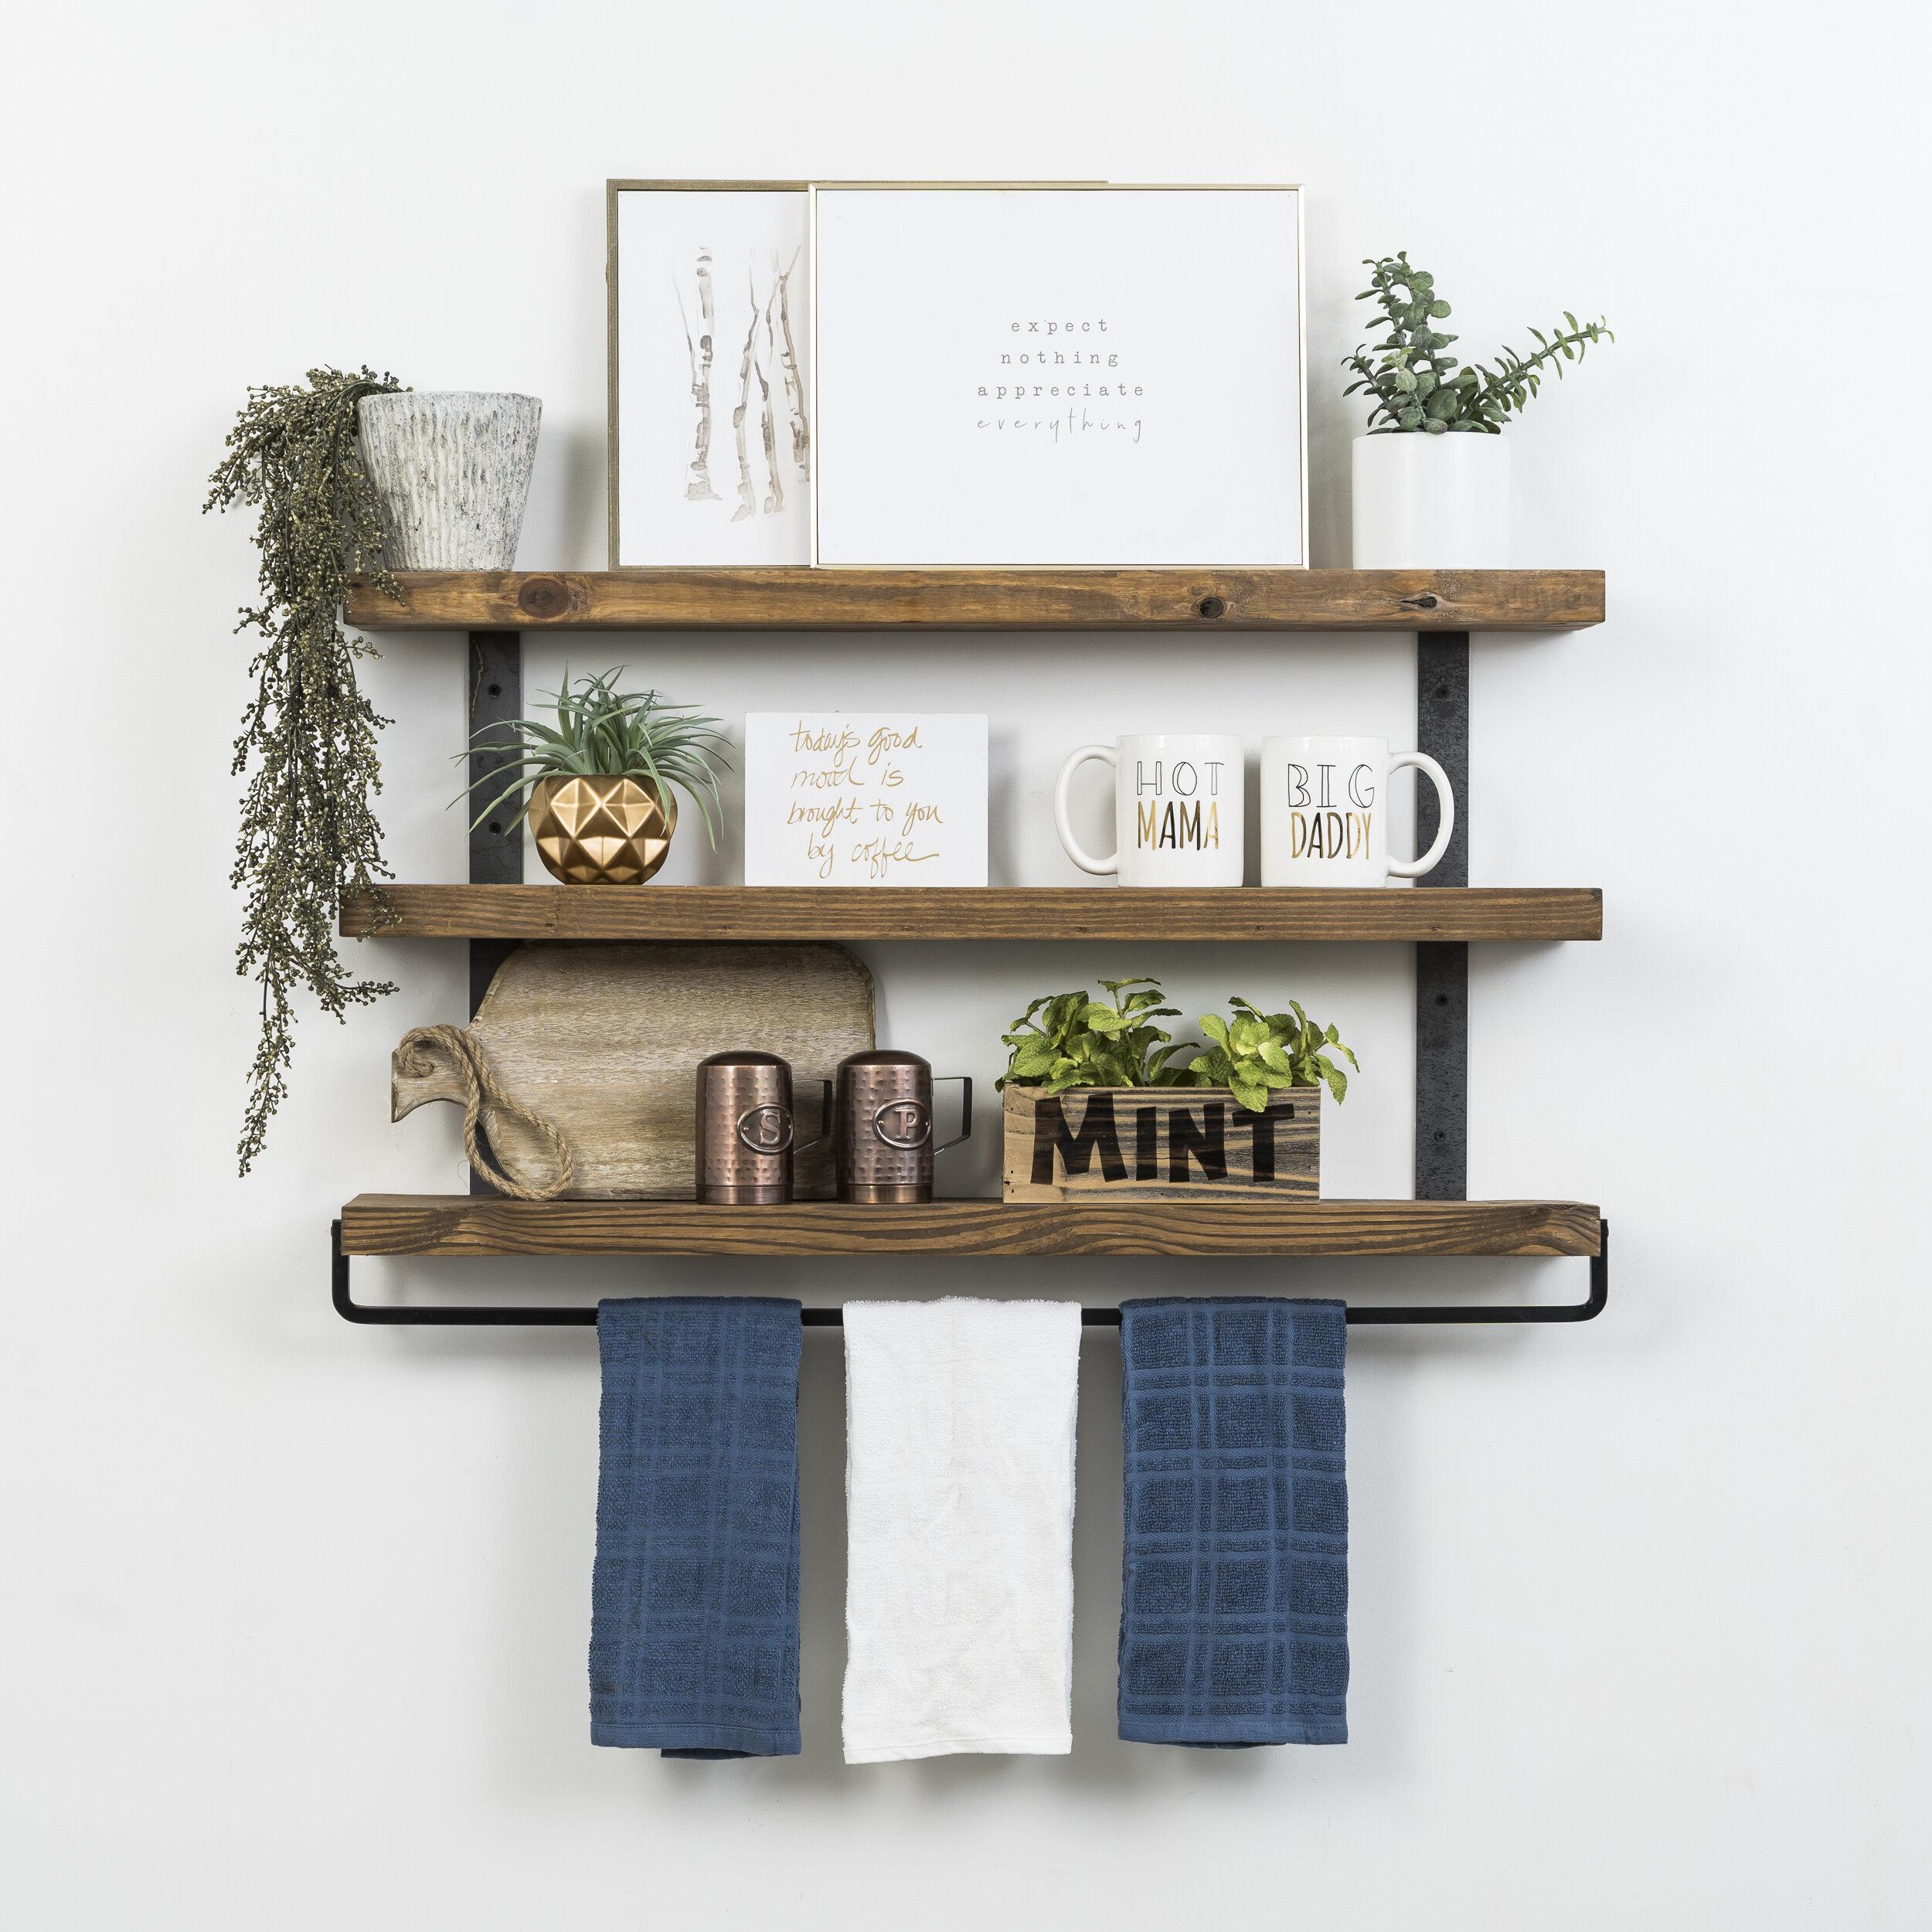 Bathroom Shelf With Towel Bar You Ll, Bathroom Shelves With Towel Bar Ideas